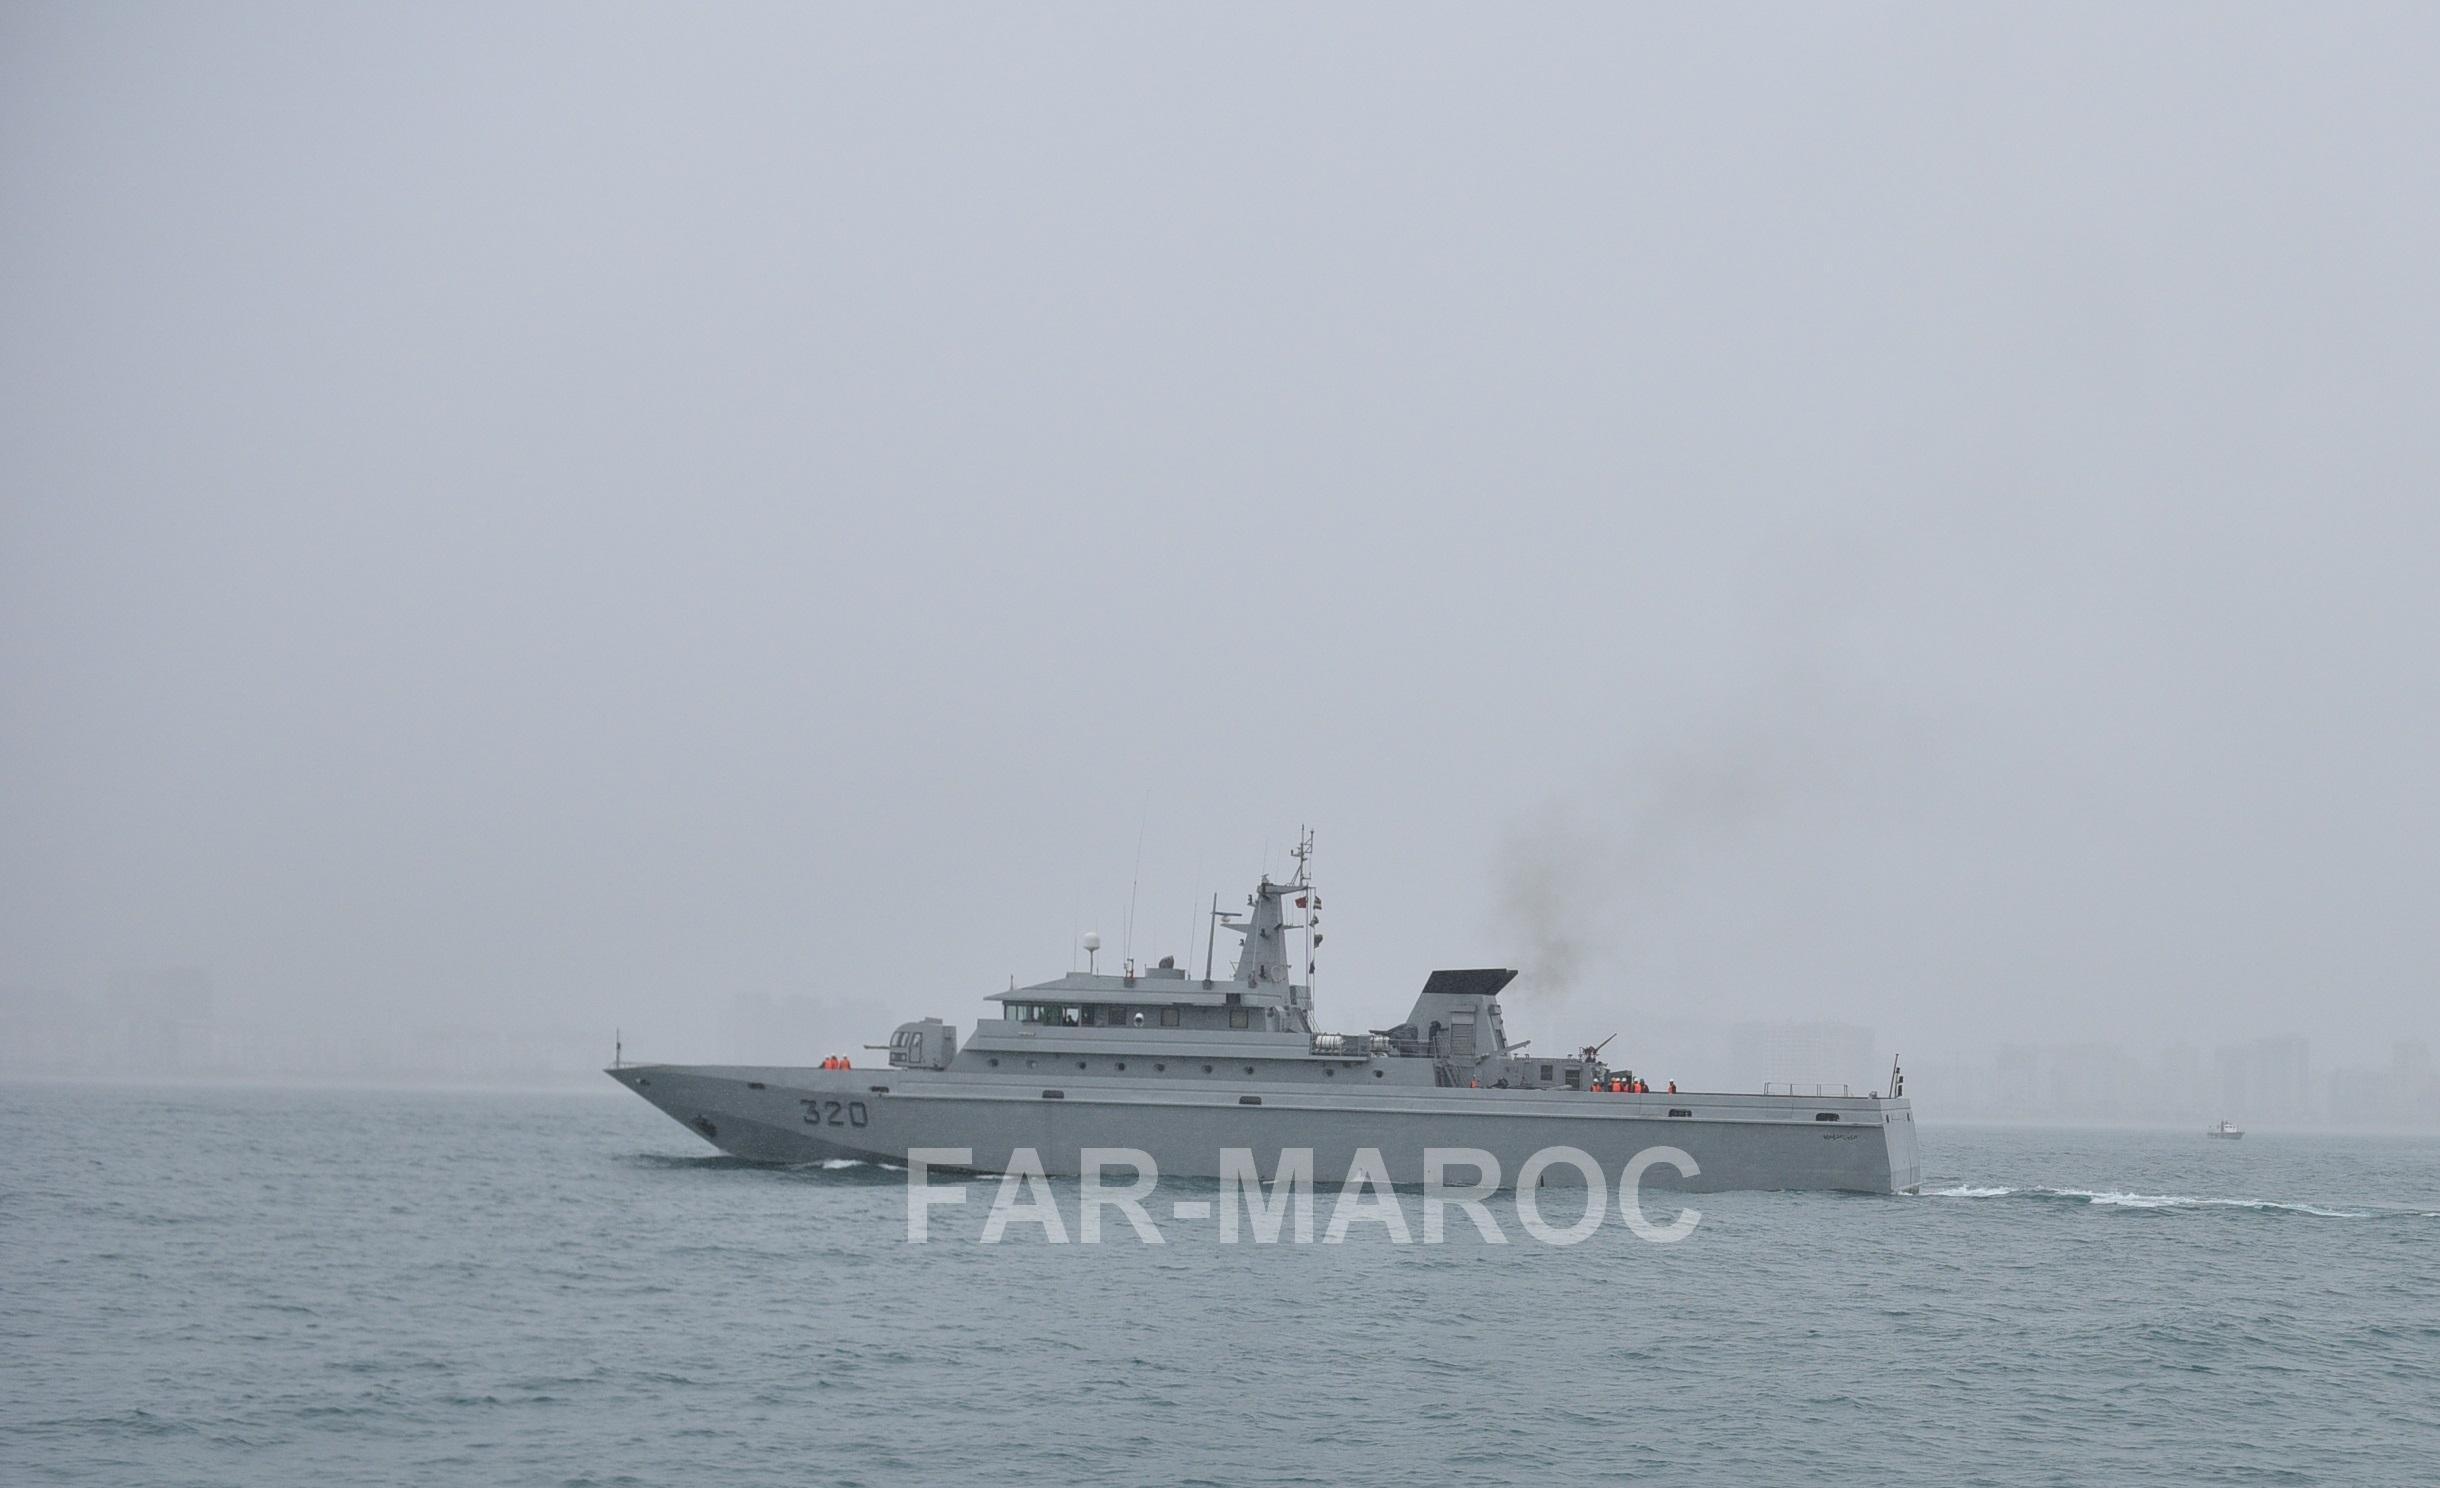 Royal Moroccan Navy Patrol Boats / Patrouilleurs de la Marine Marocaine - Page 14 32855906607_8c1bb31e3d_o